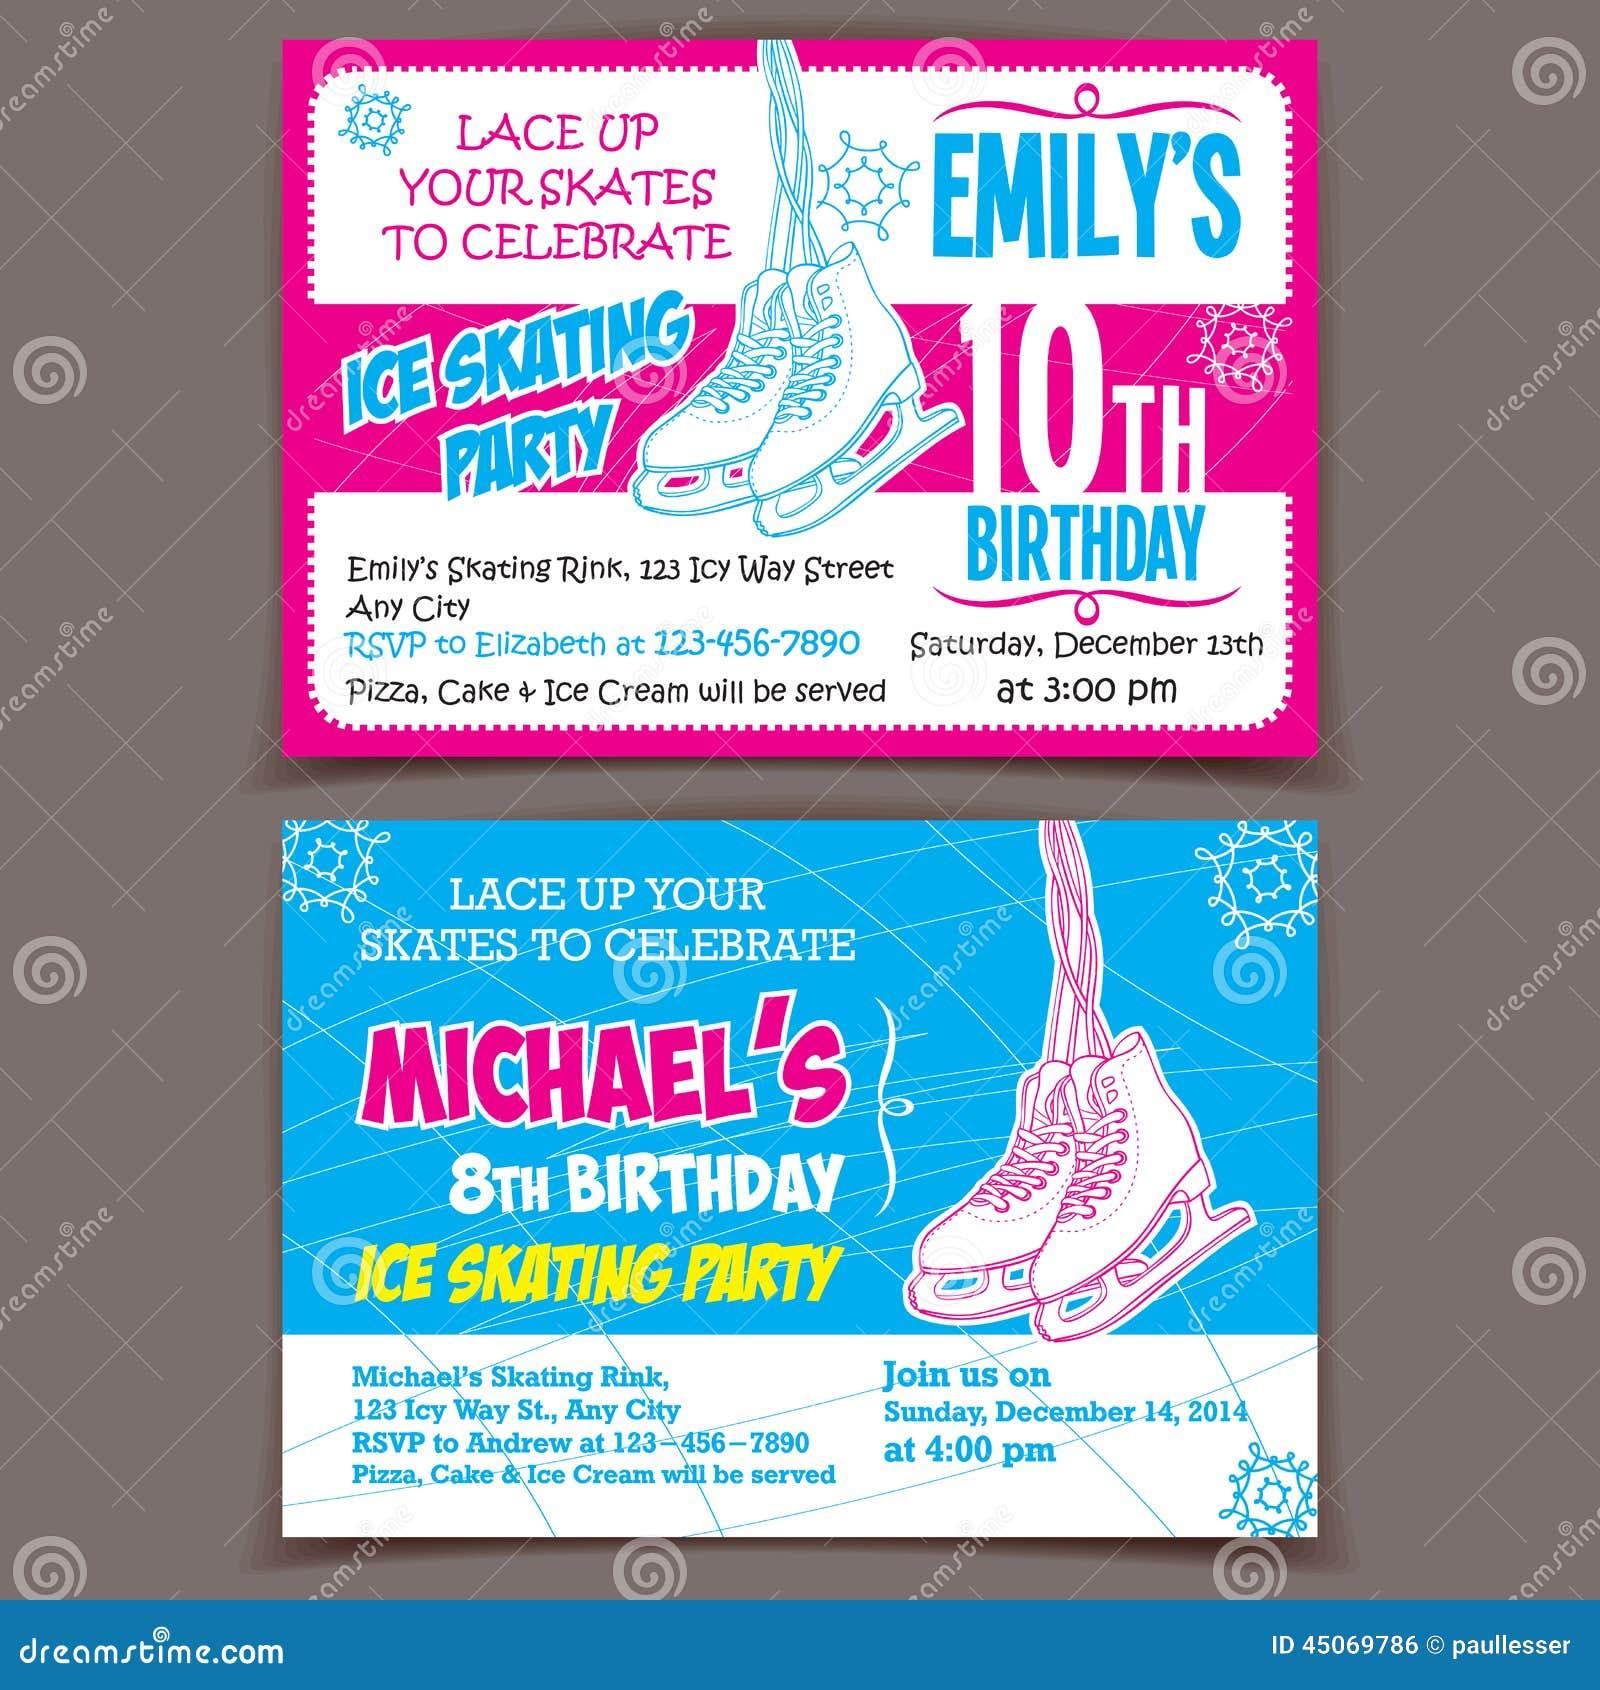 printable girl birthday invitation cards - Kardas.klmphotography.co